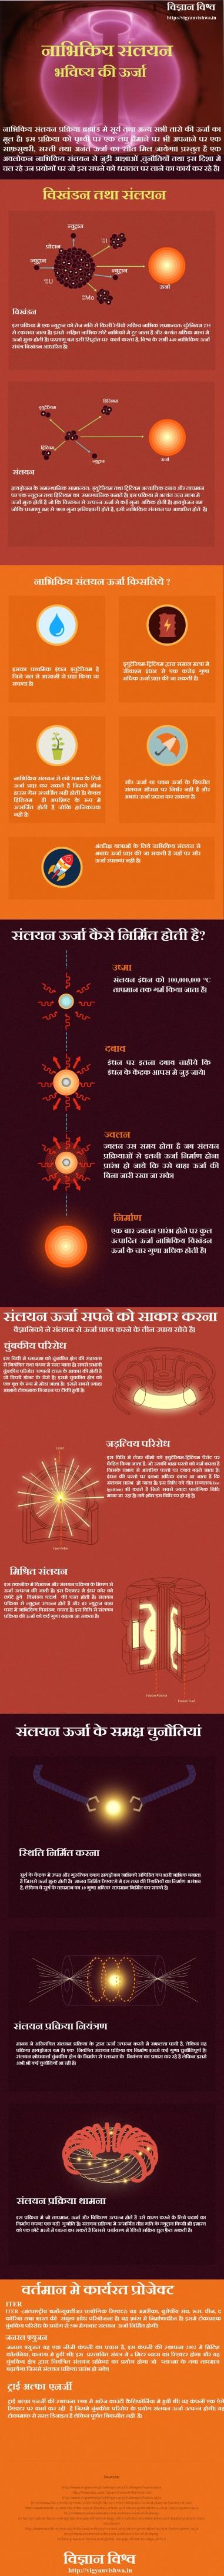 fusion-energy_v2-hindi